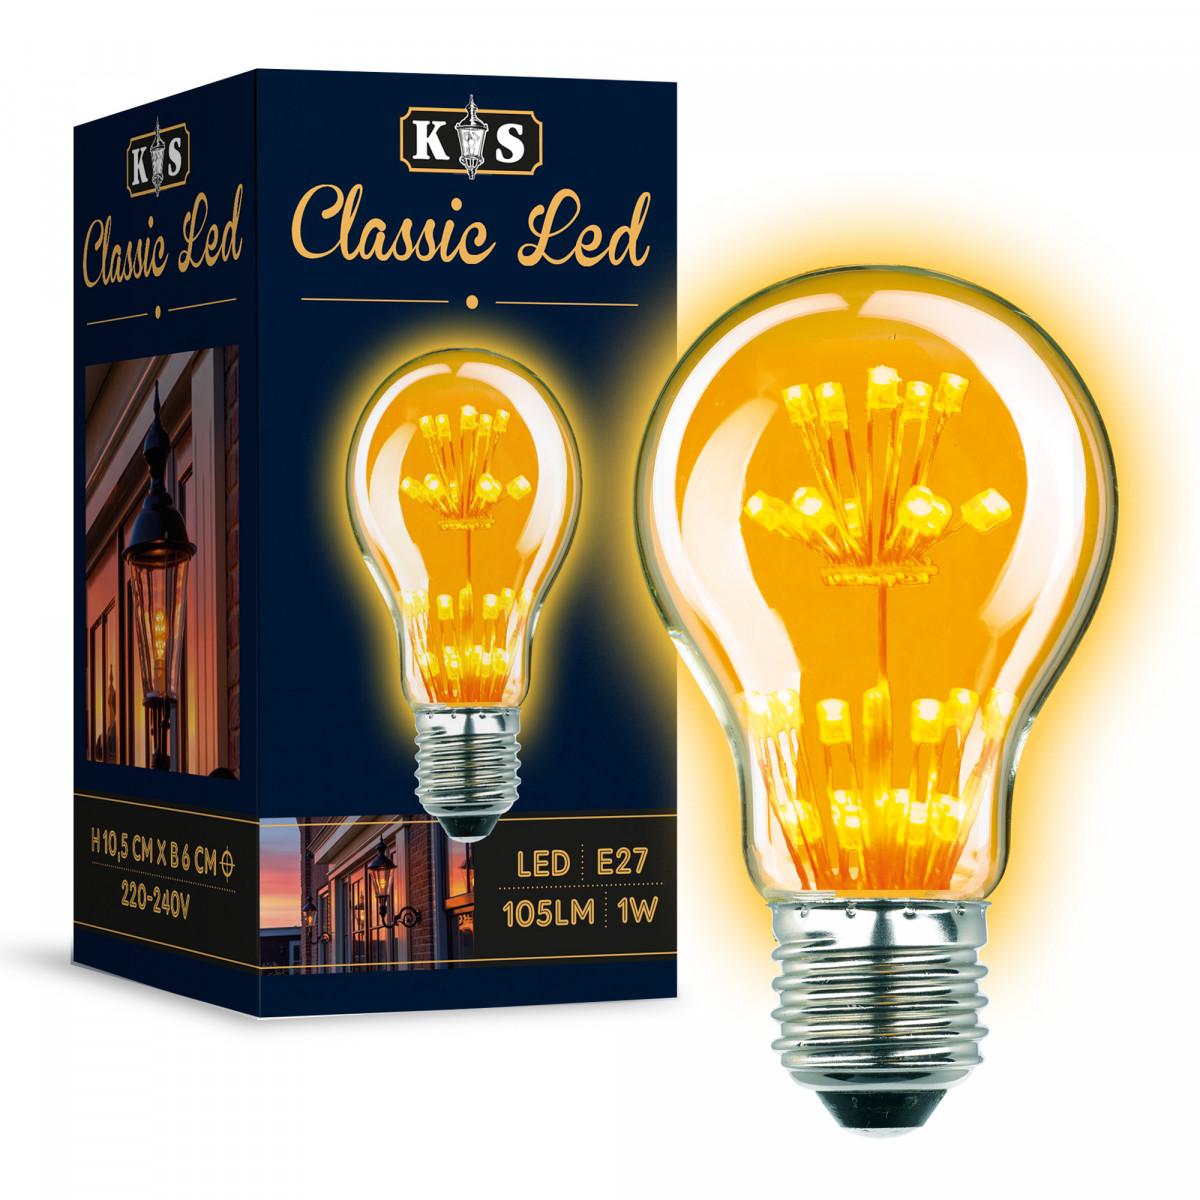 Ledlamp 5883 classic led lamp lichtbron